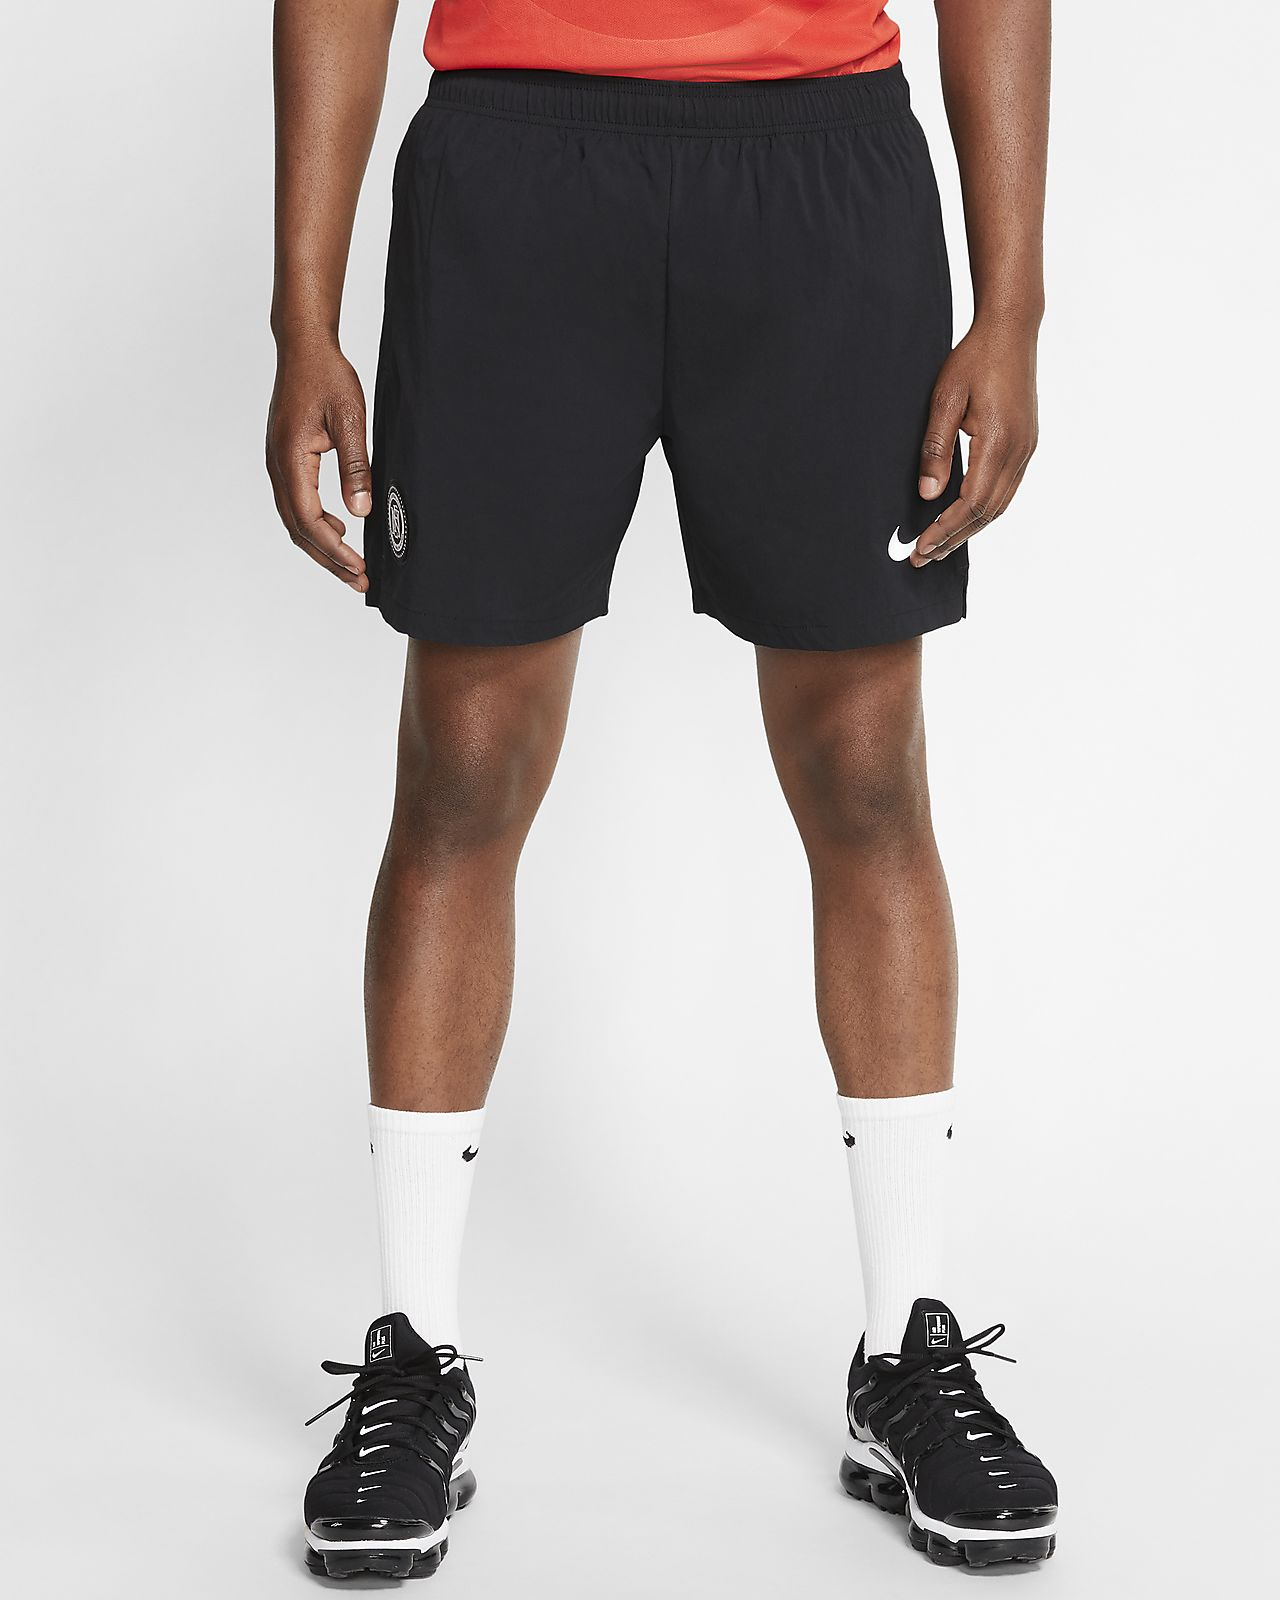 Nike F.C. Men's Woven Soccer Shorts